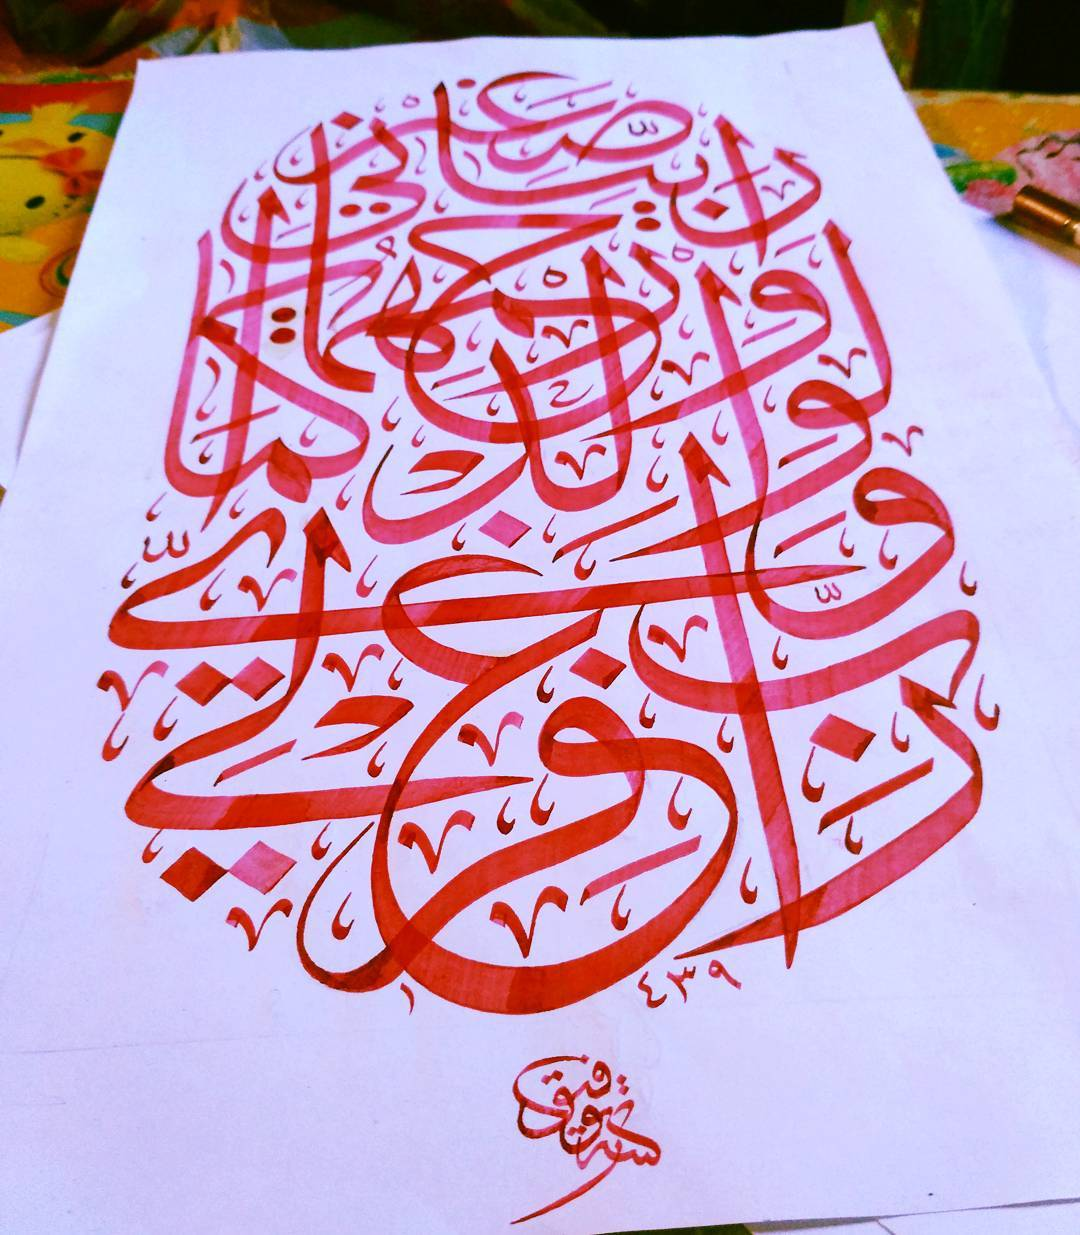 Works Calligraphy Taufik Hasibuan رب اغفرلي ولوالدي وارحمهما كما ربياني صغيرا... 91 1